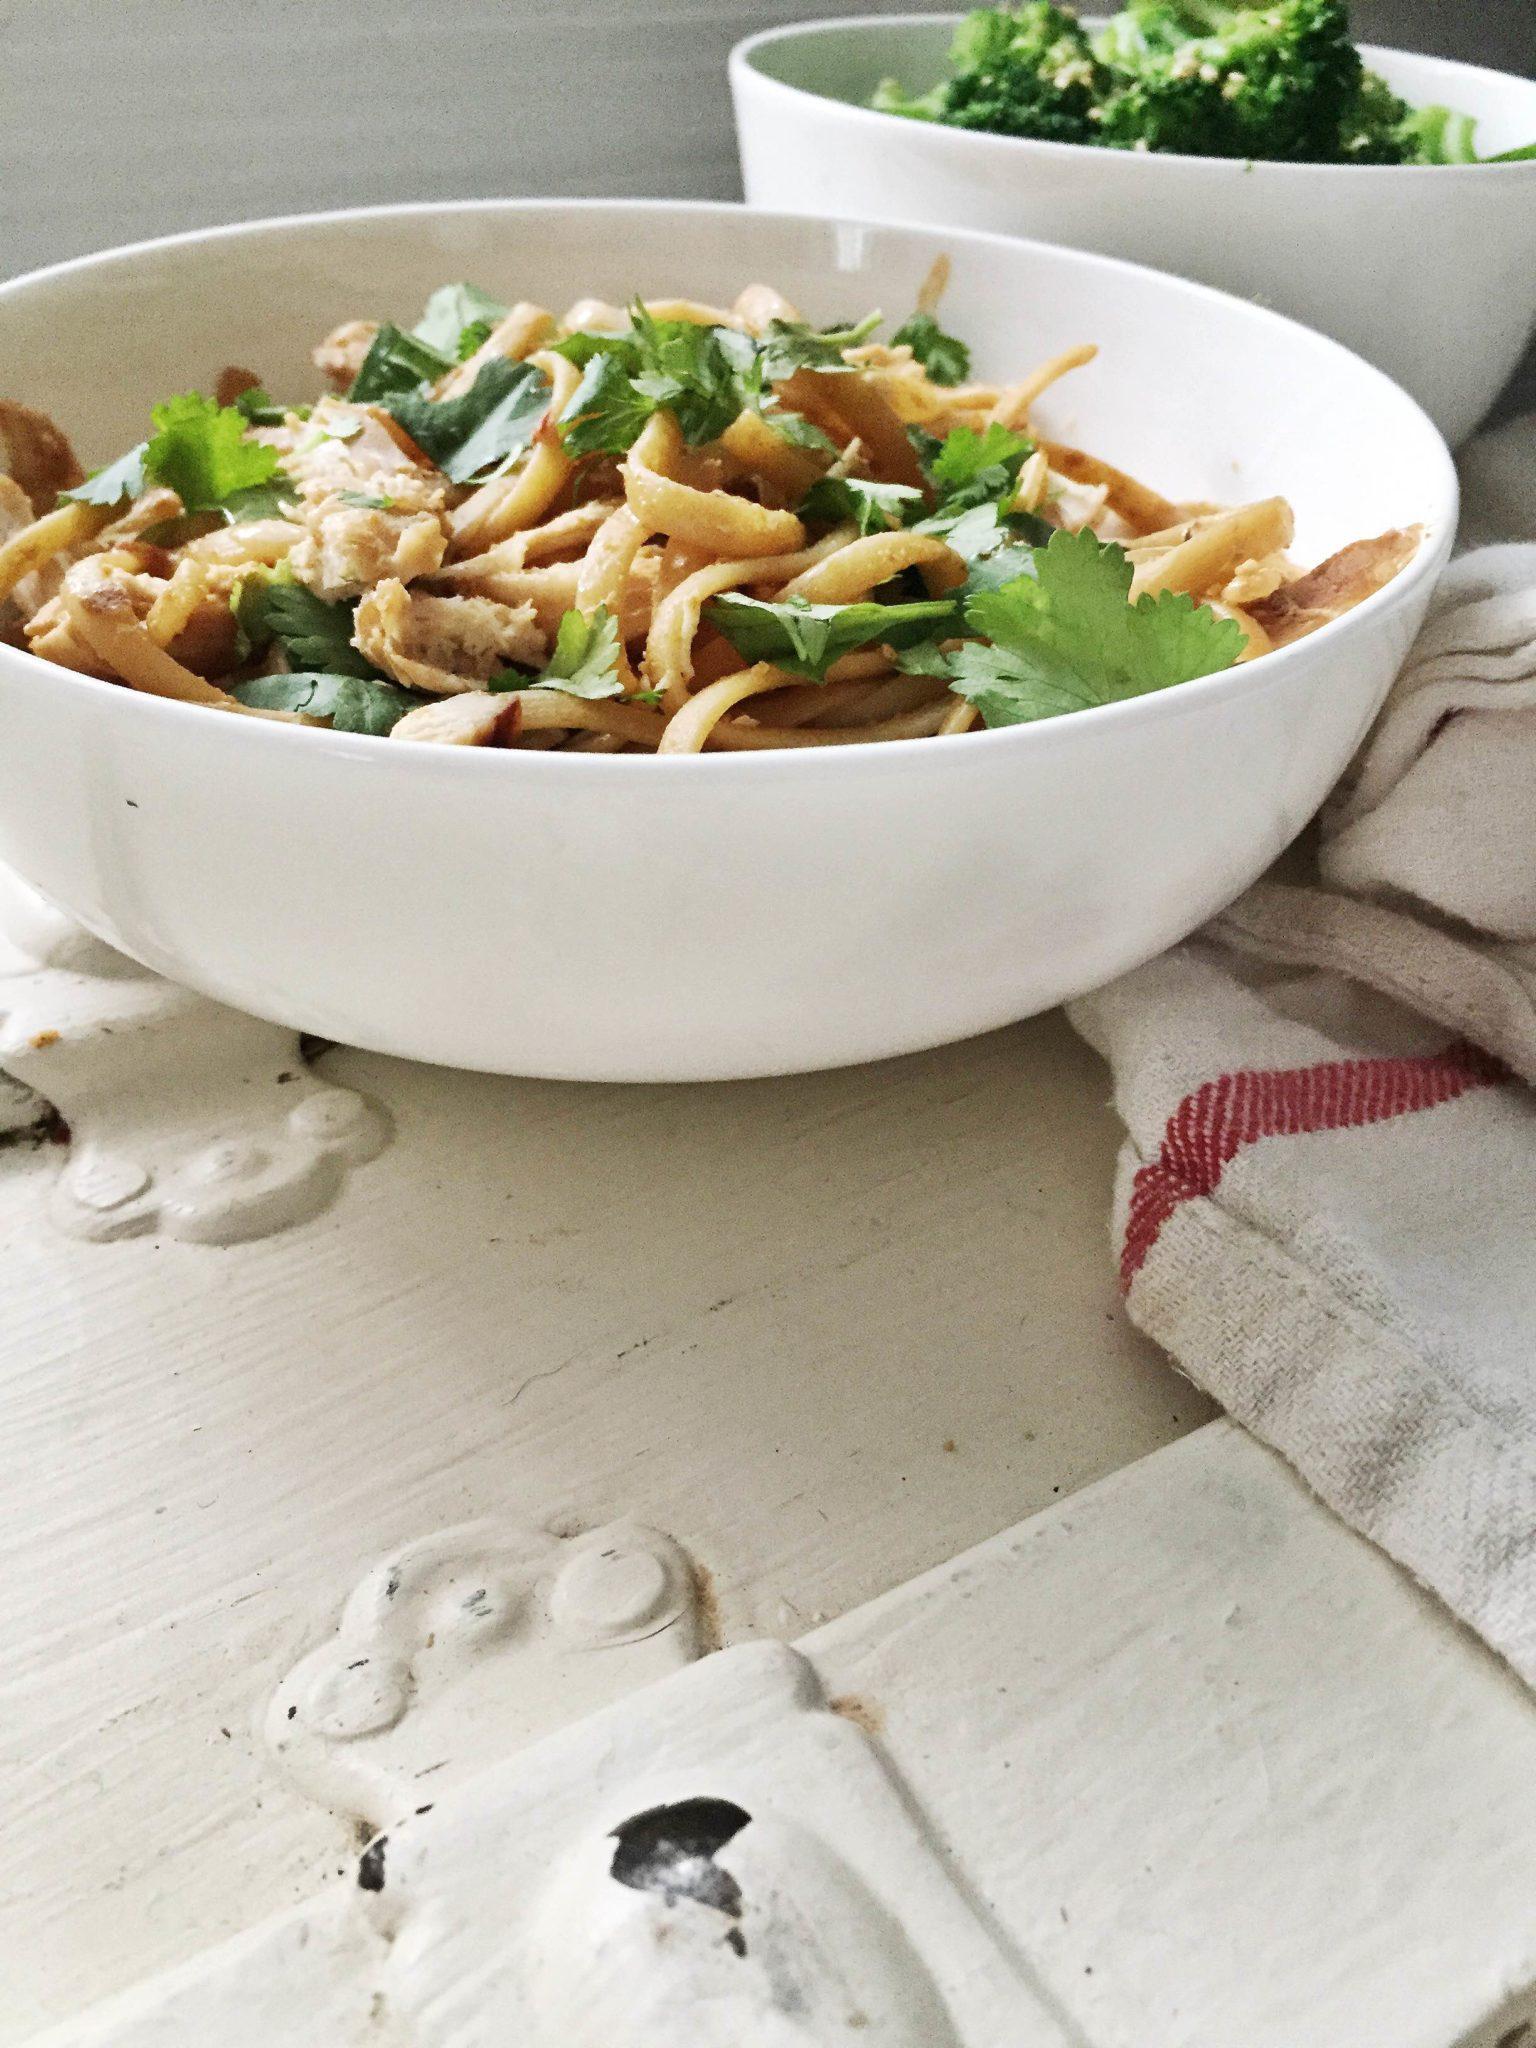 Peanut Chicken Noodle Bowls